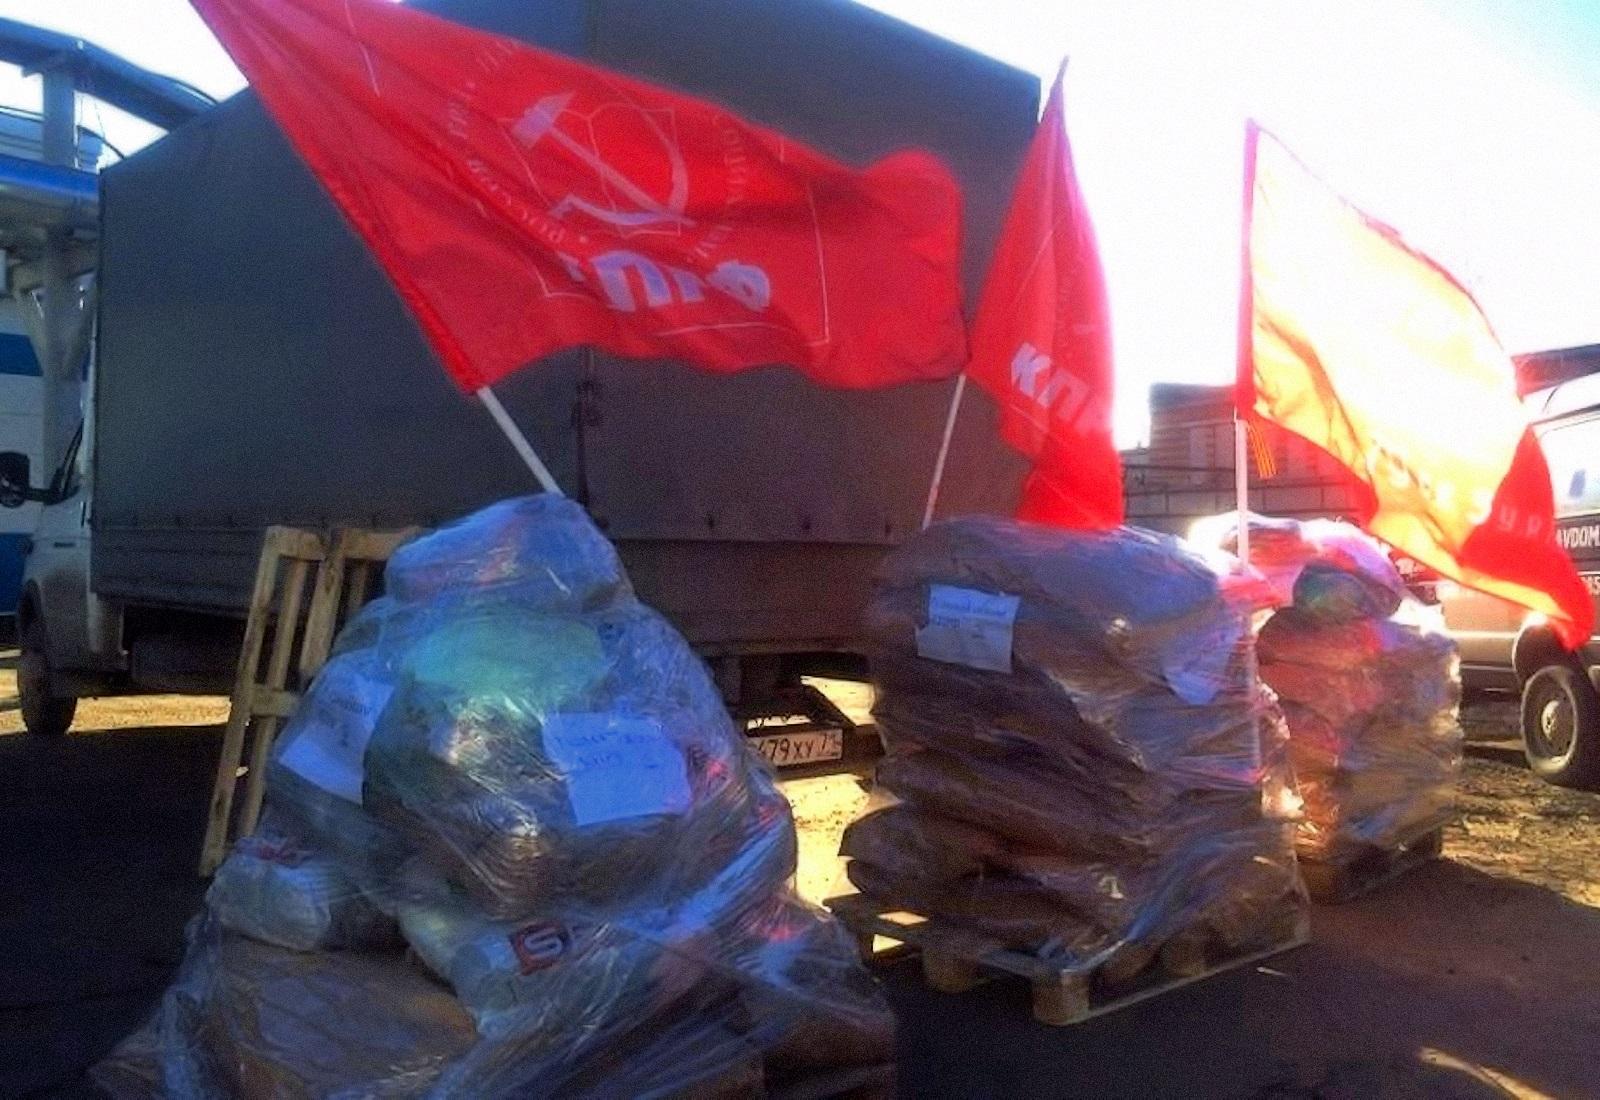 00 Tula KPRF aid to Novorossiya russia 090416